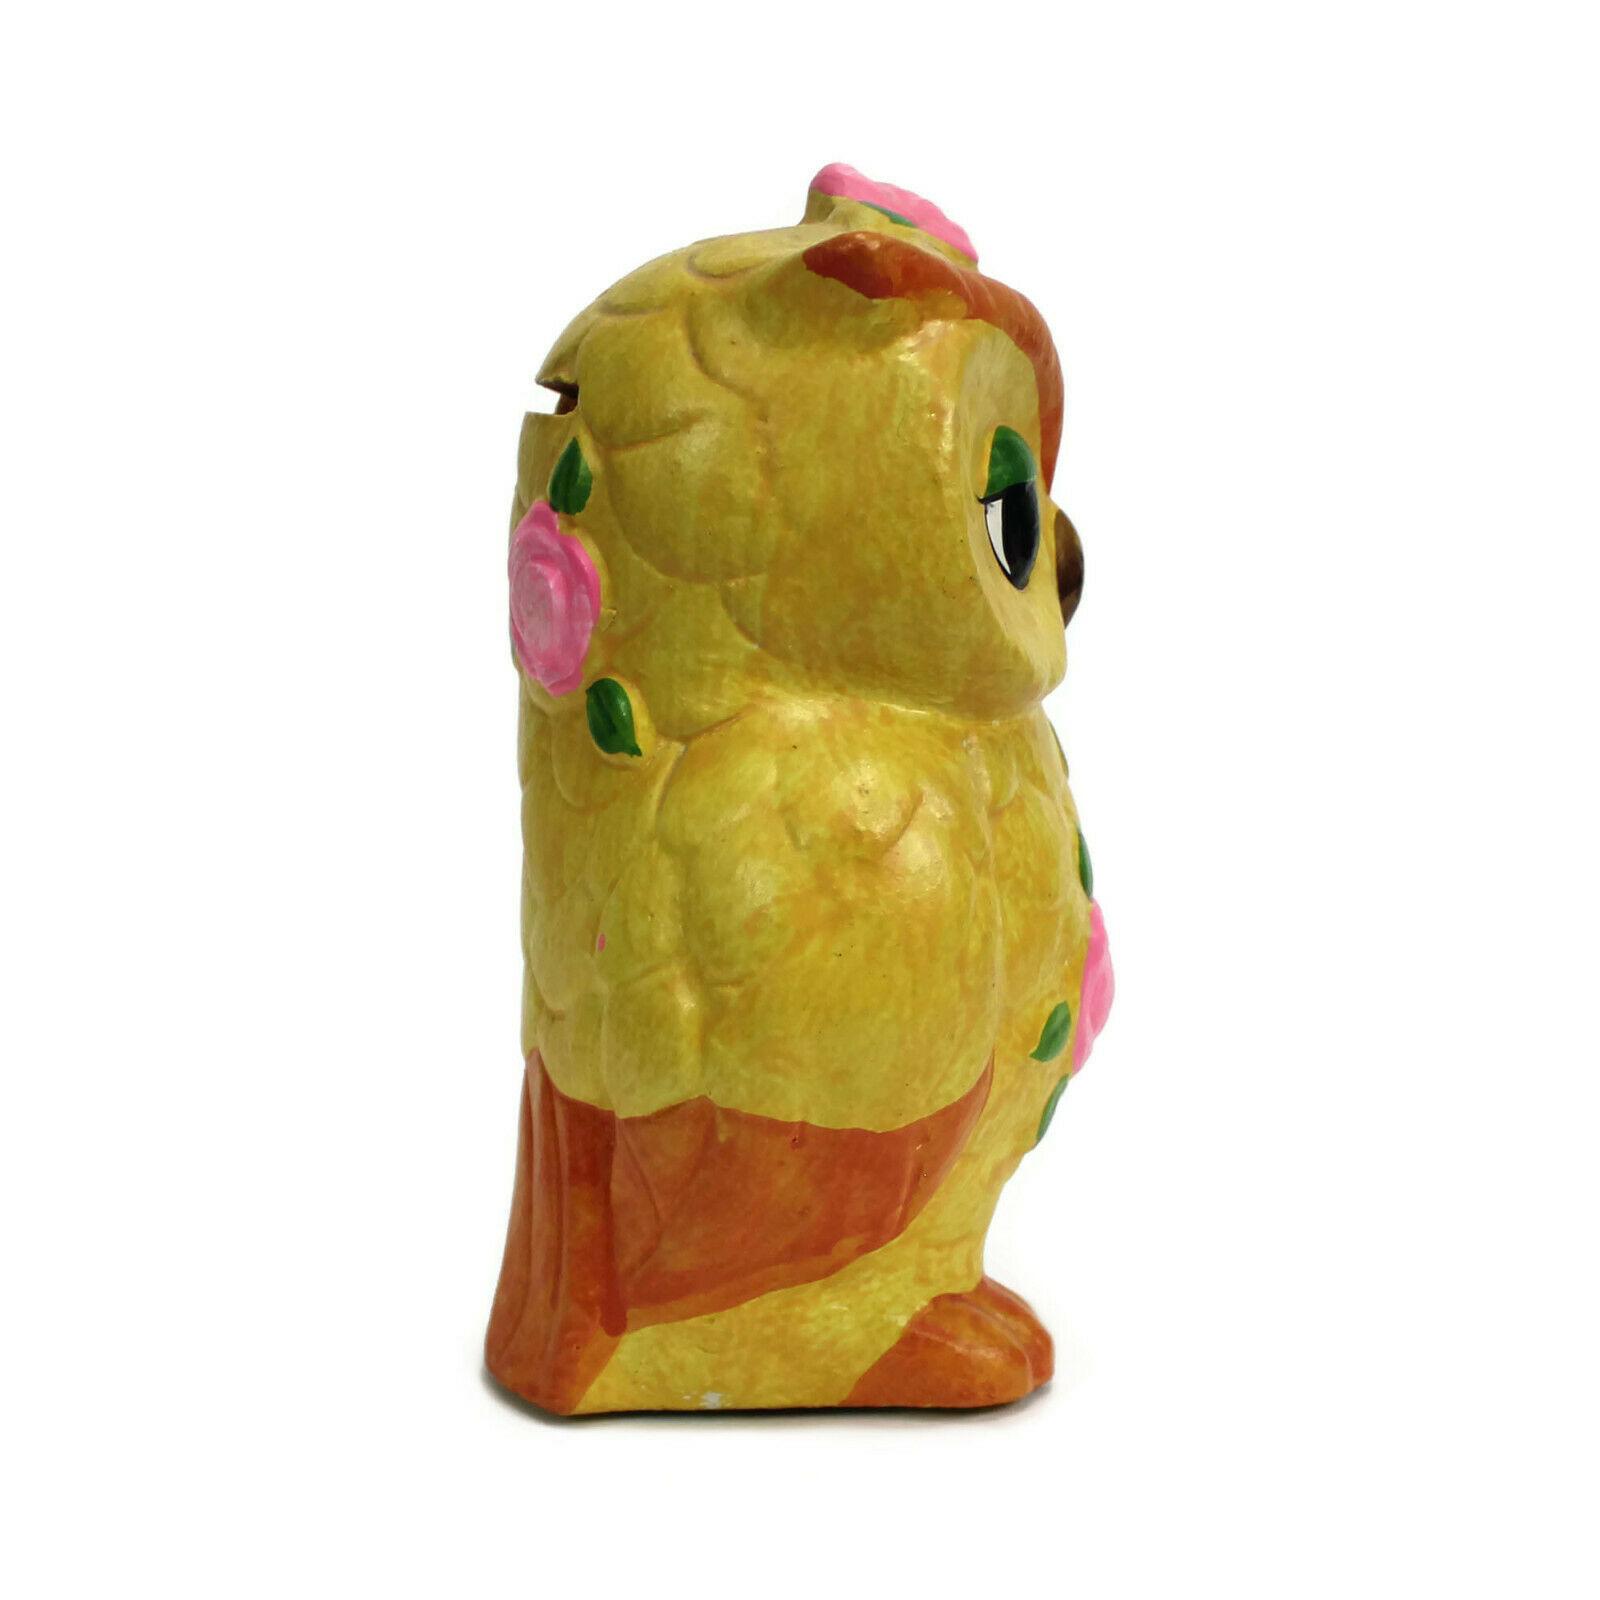 "Retro OWL Piggy Bank | Vintage Mid Century Kitsch | 6"" High | Handpainted"